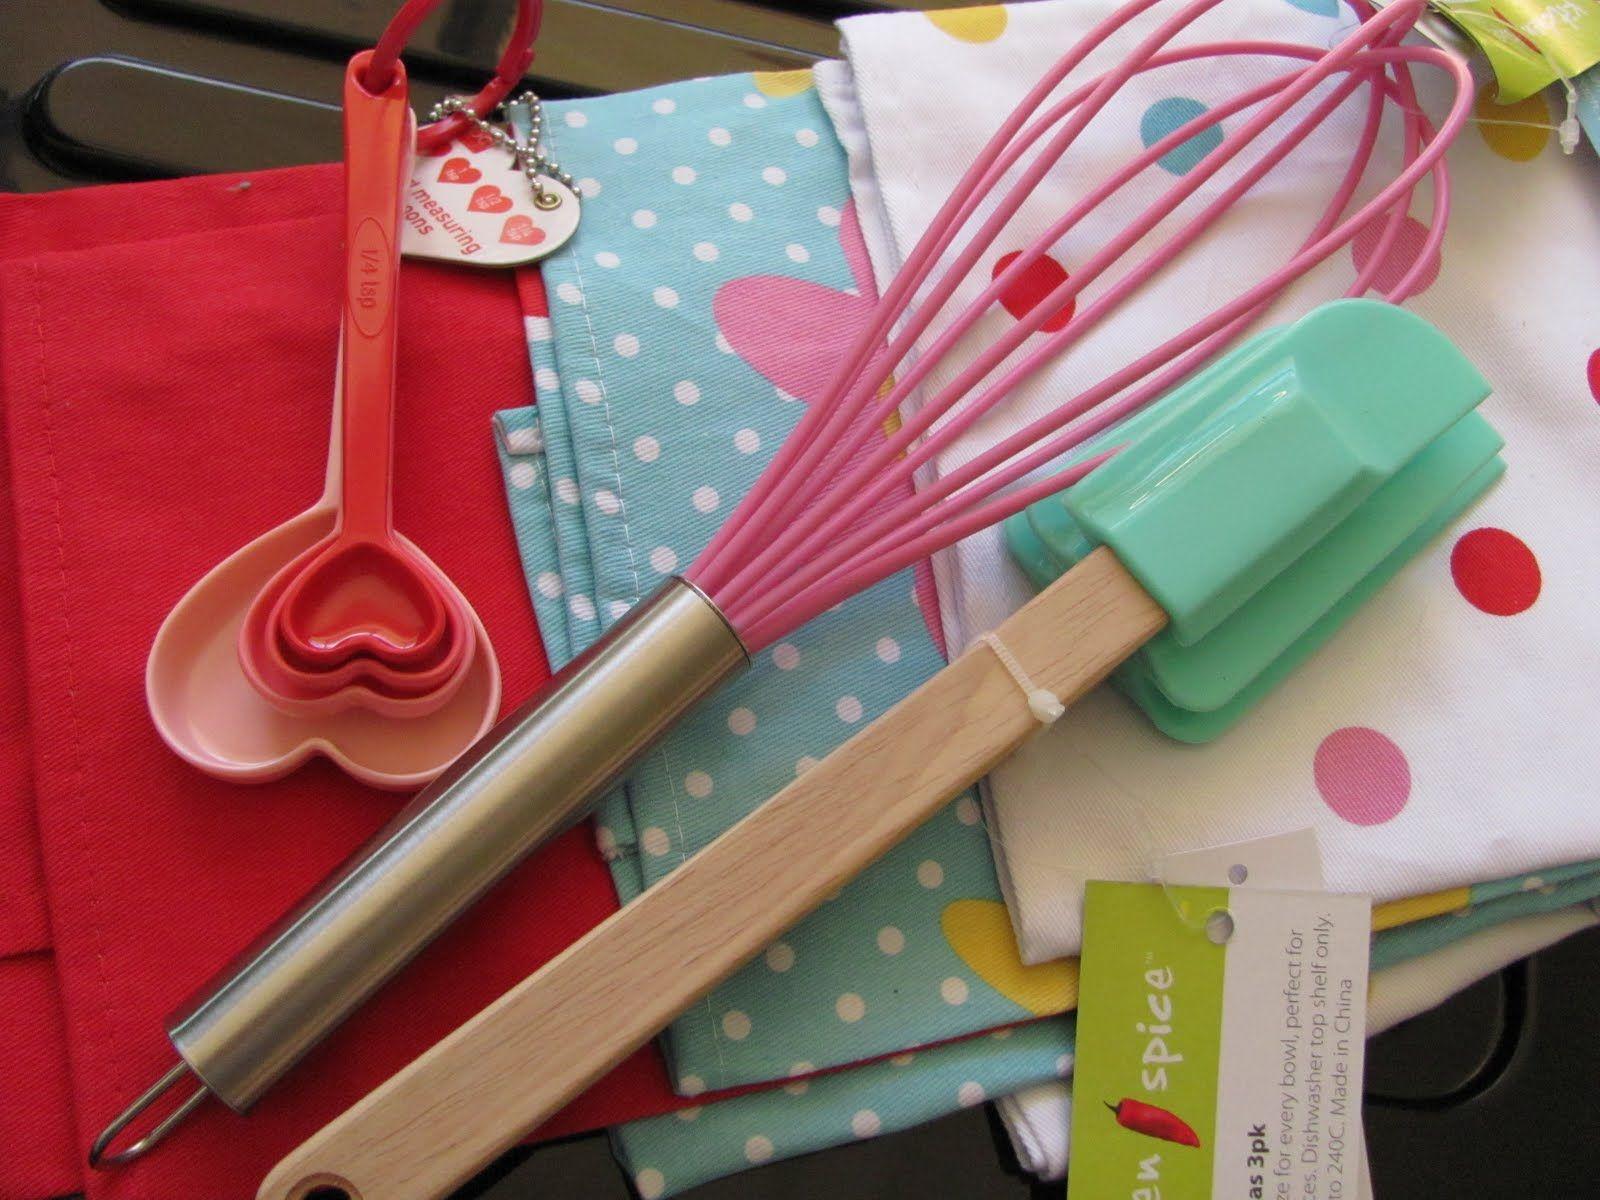 cute kitchen gadgets aid mixer cream accessories made by dustland fairytale